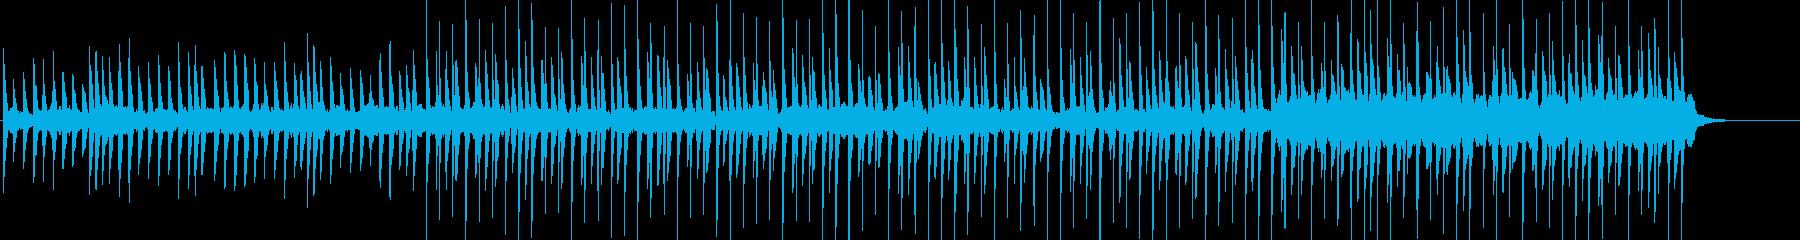 Corporate Synth 126の再生済みの波形